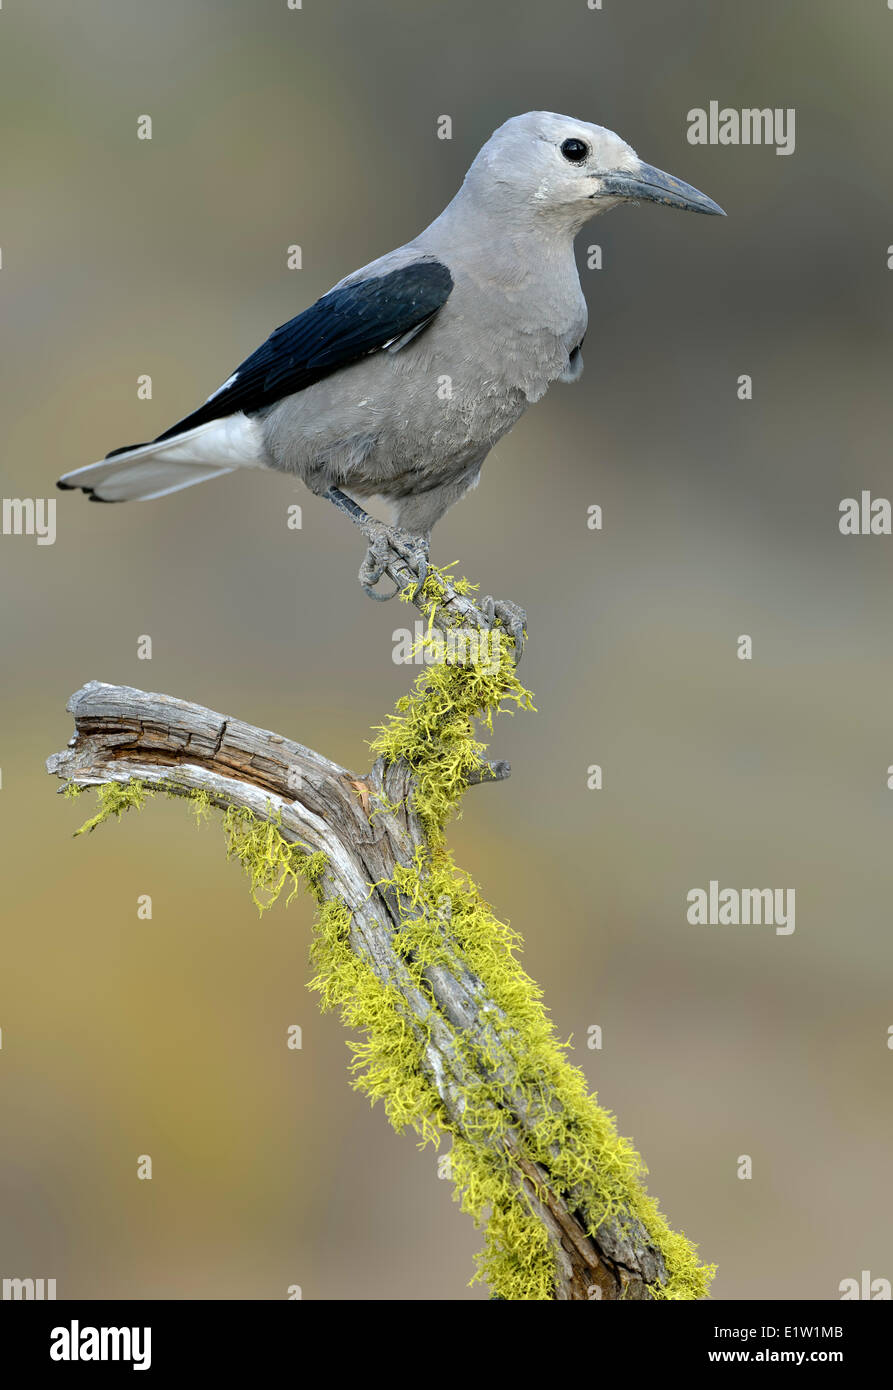 Clark's Nutcracker (Nucifraga columbiana) - Dechutes National Forest, oregon - Stock Image